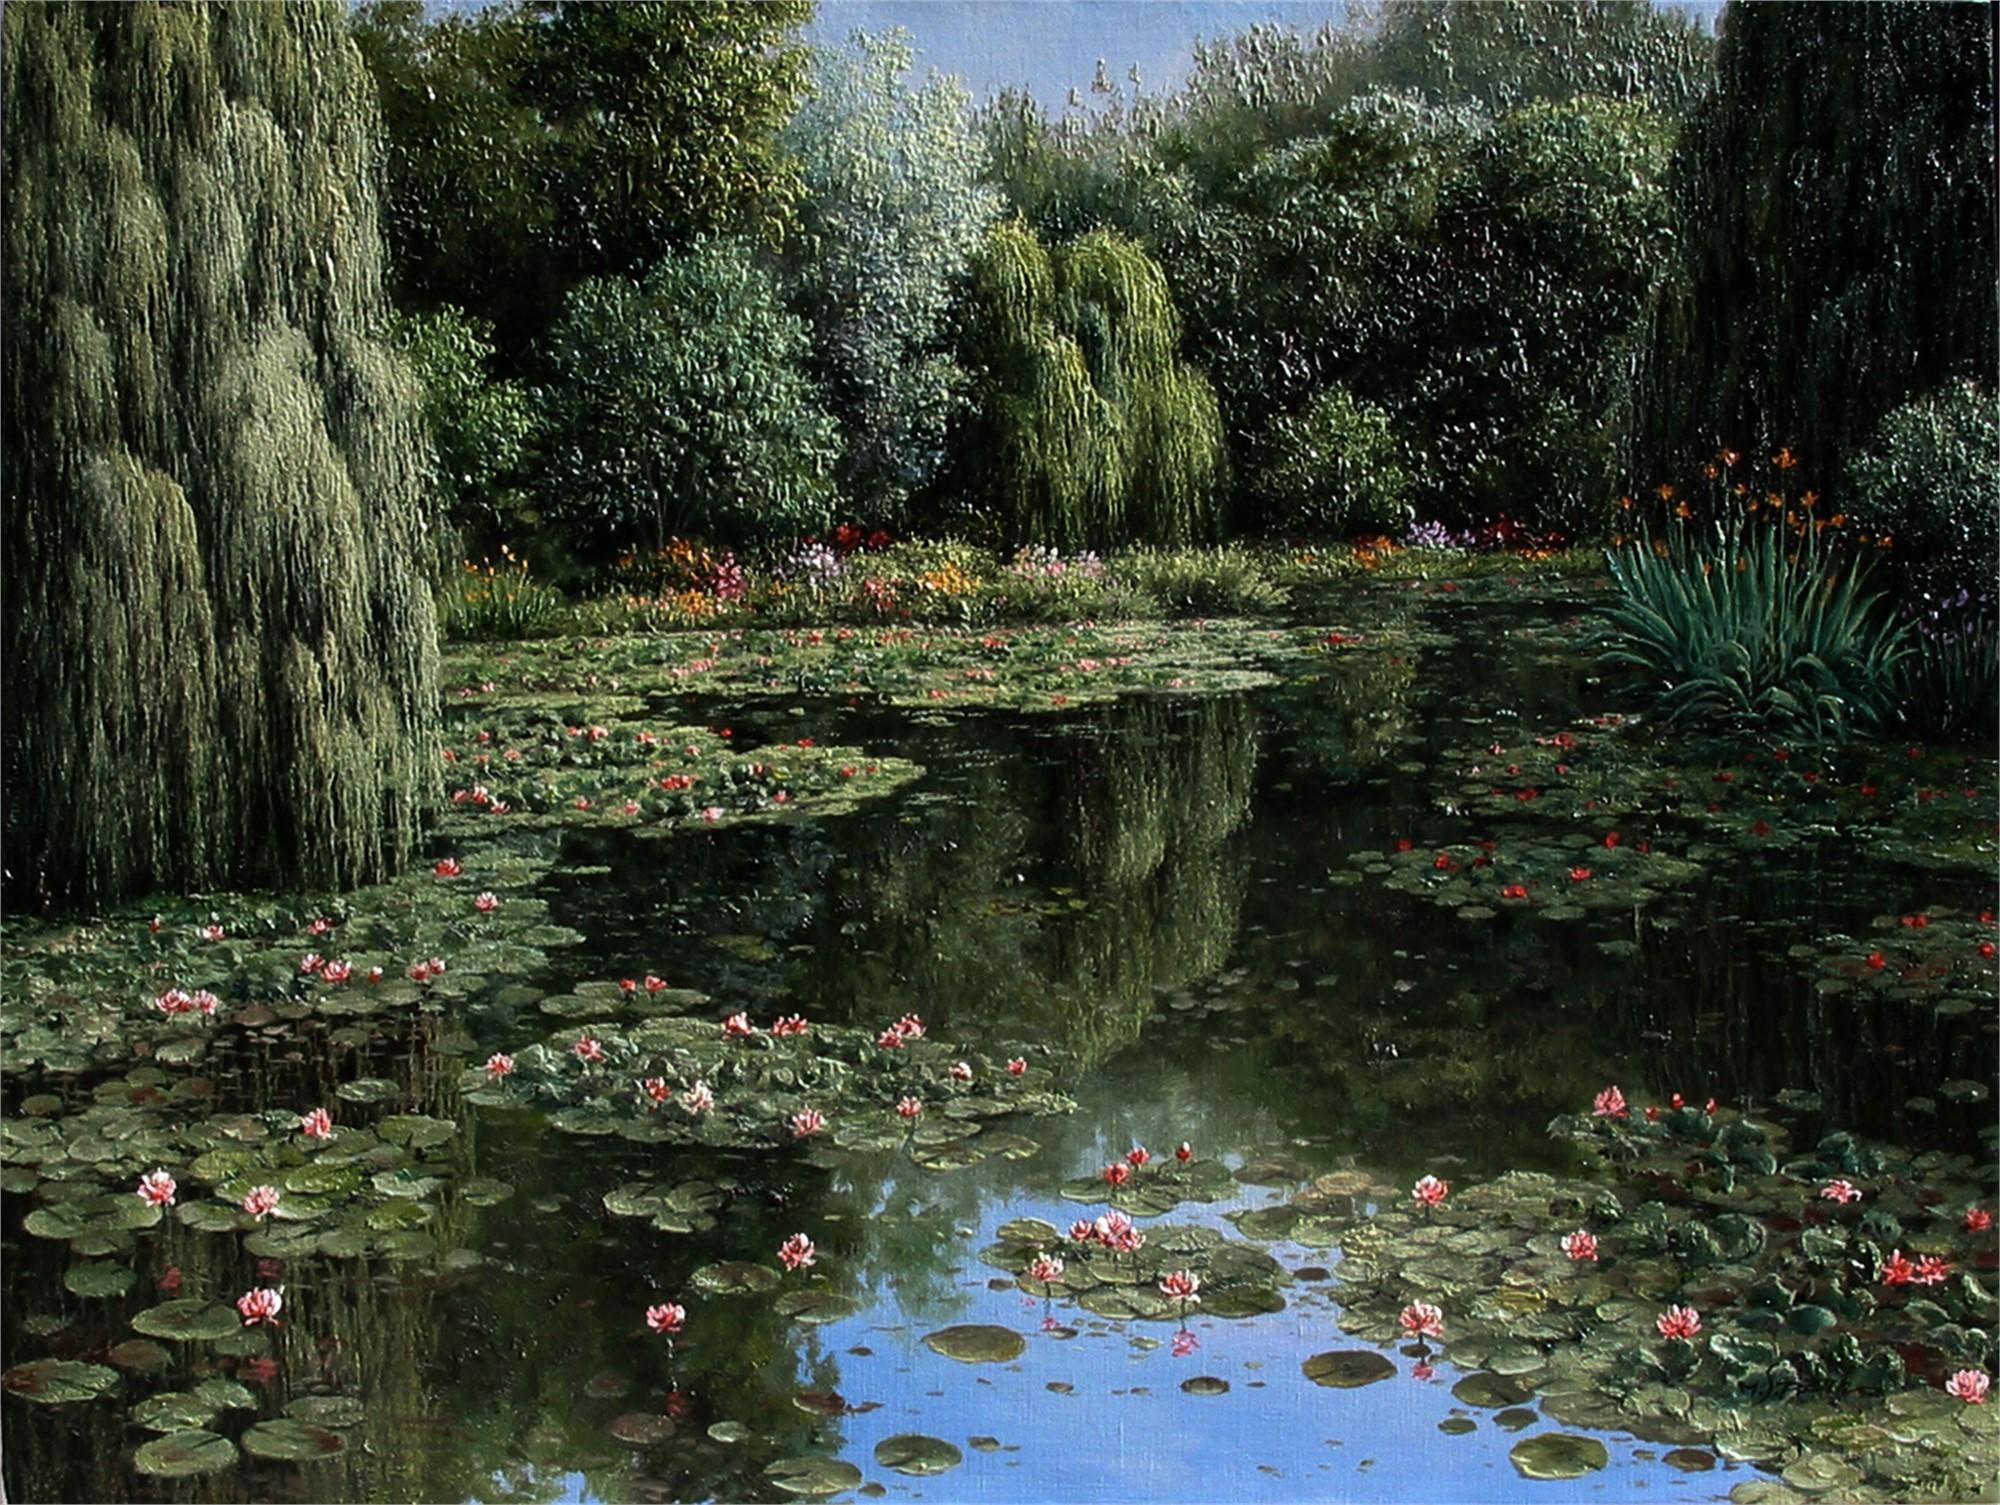 Shadows of Monet's Garden by M.S. PARK